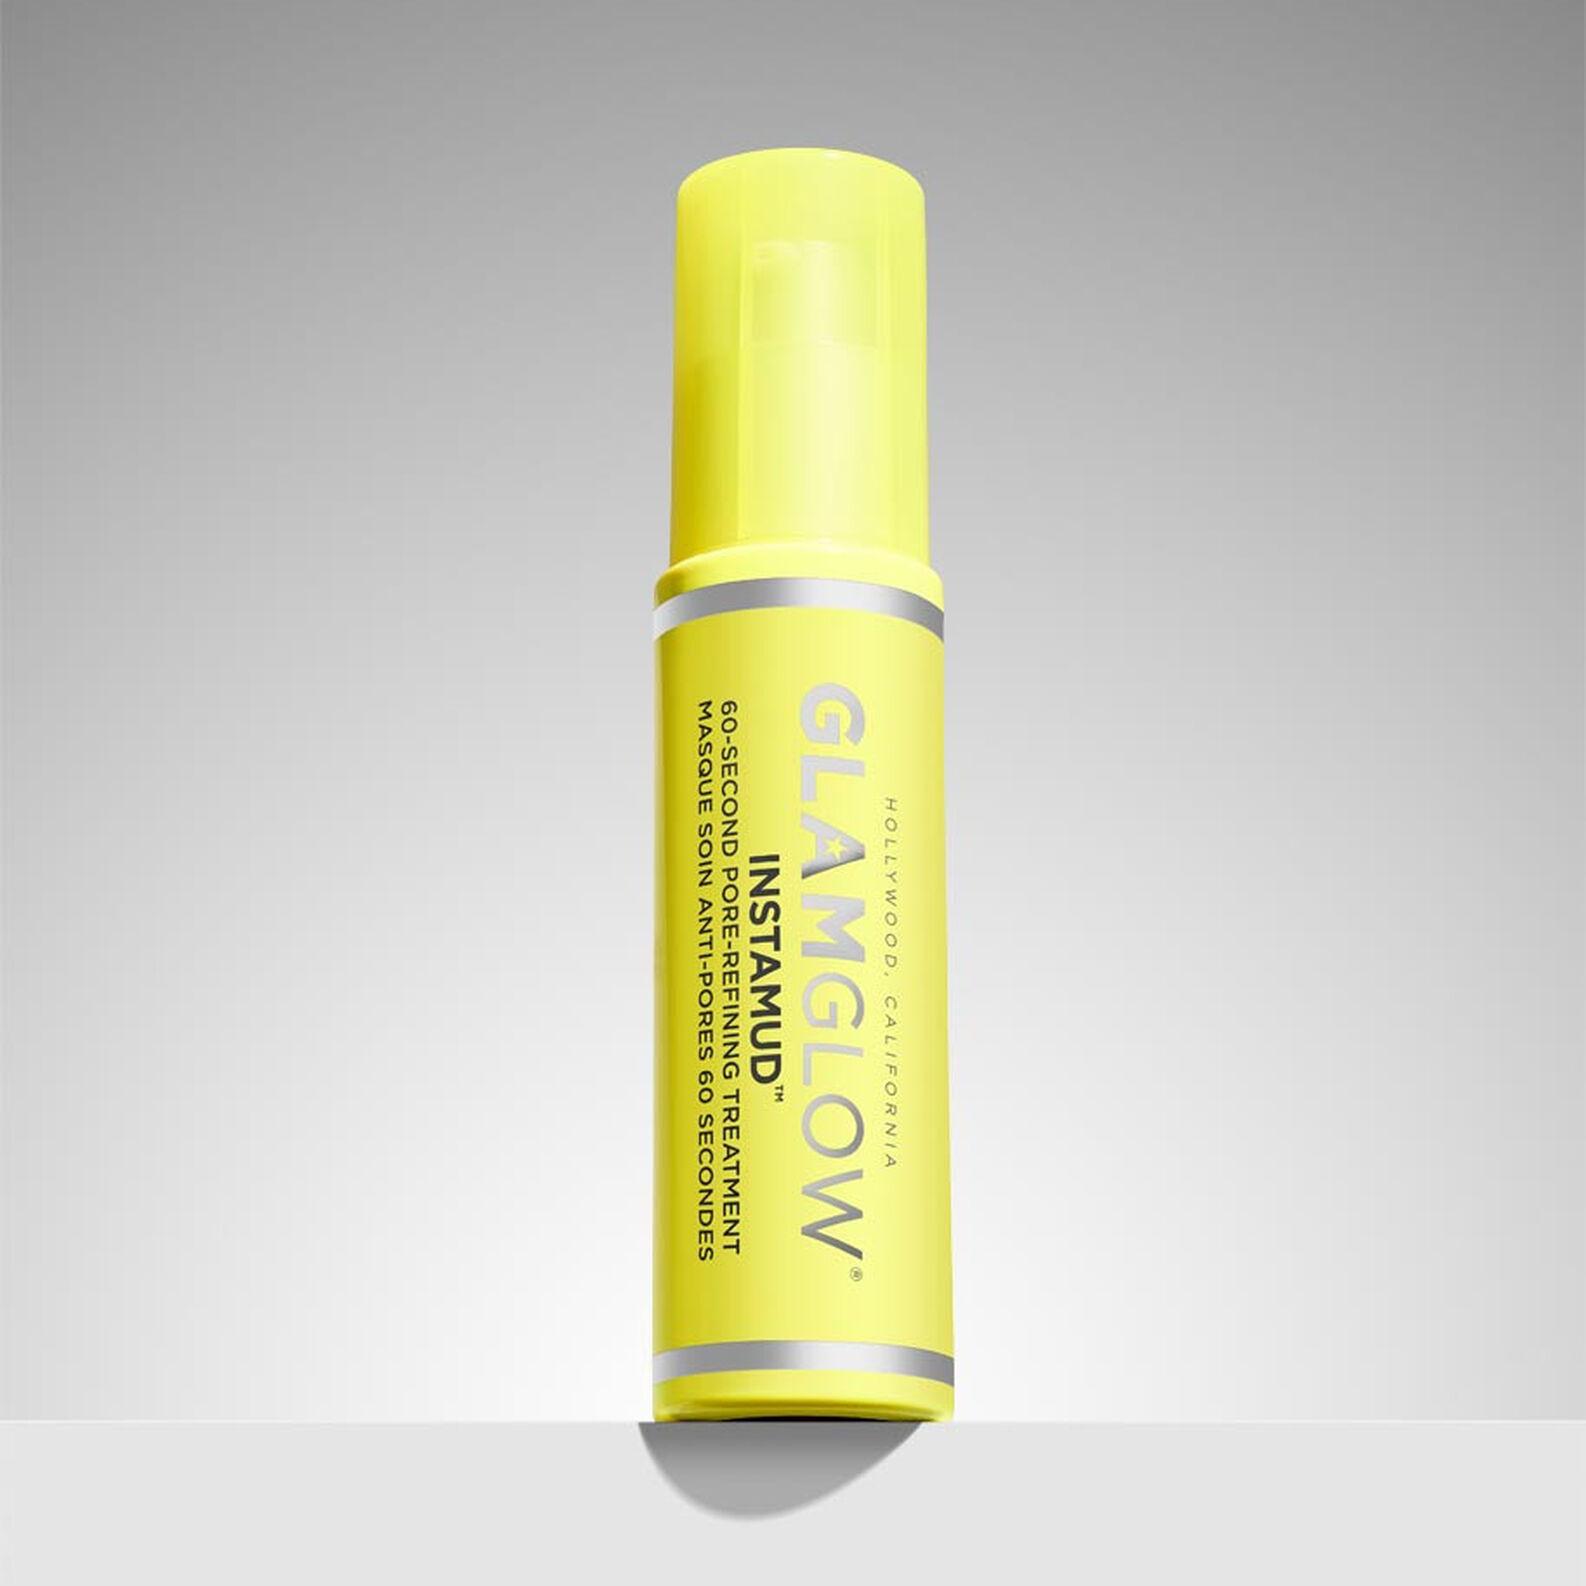 Glamglow instamud - pore refining treatment